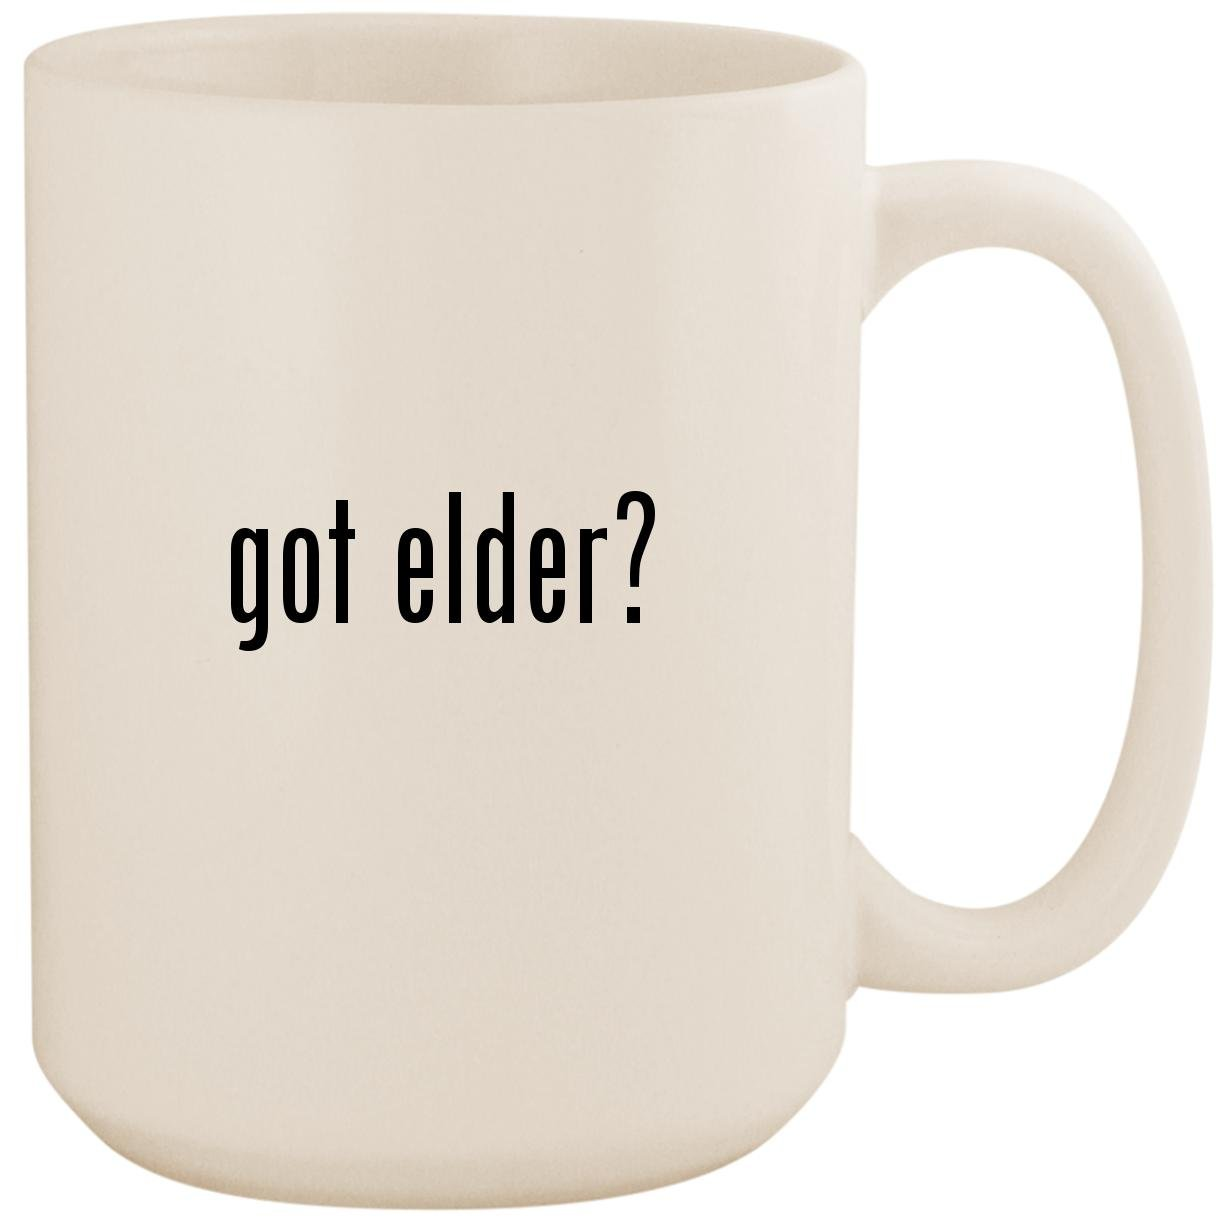 Got Elder  – ホワイト425セラミックコーヒーマグカップ   B0742945P4